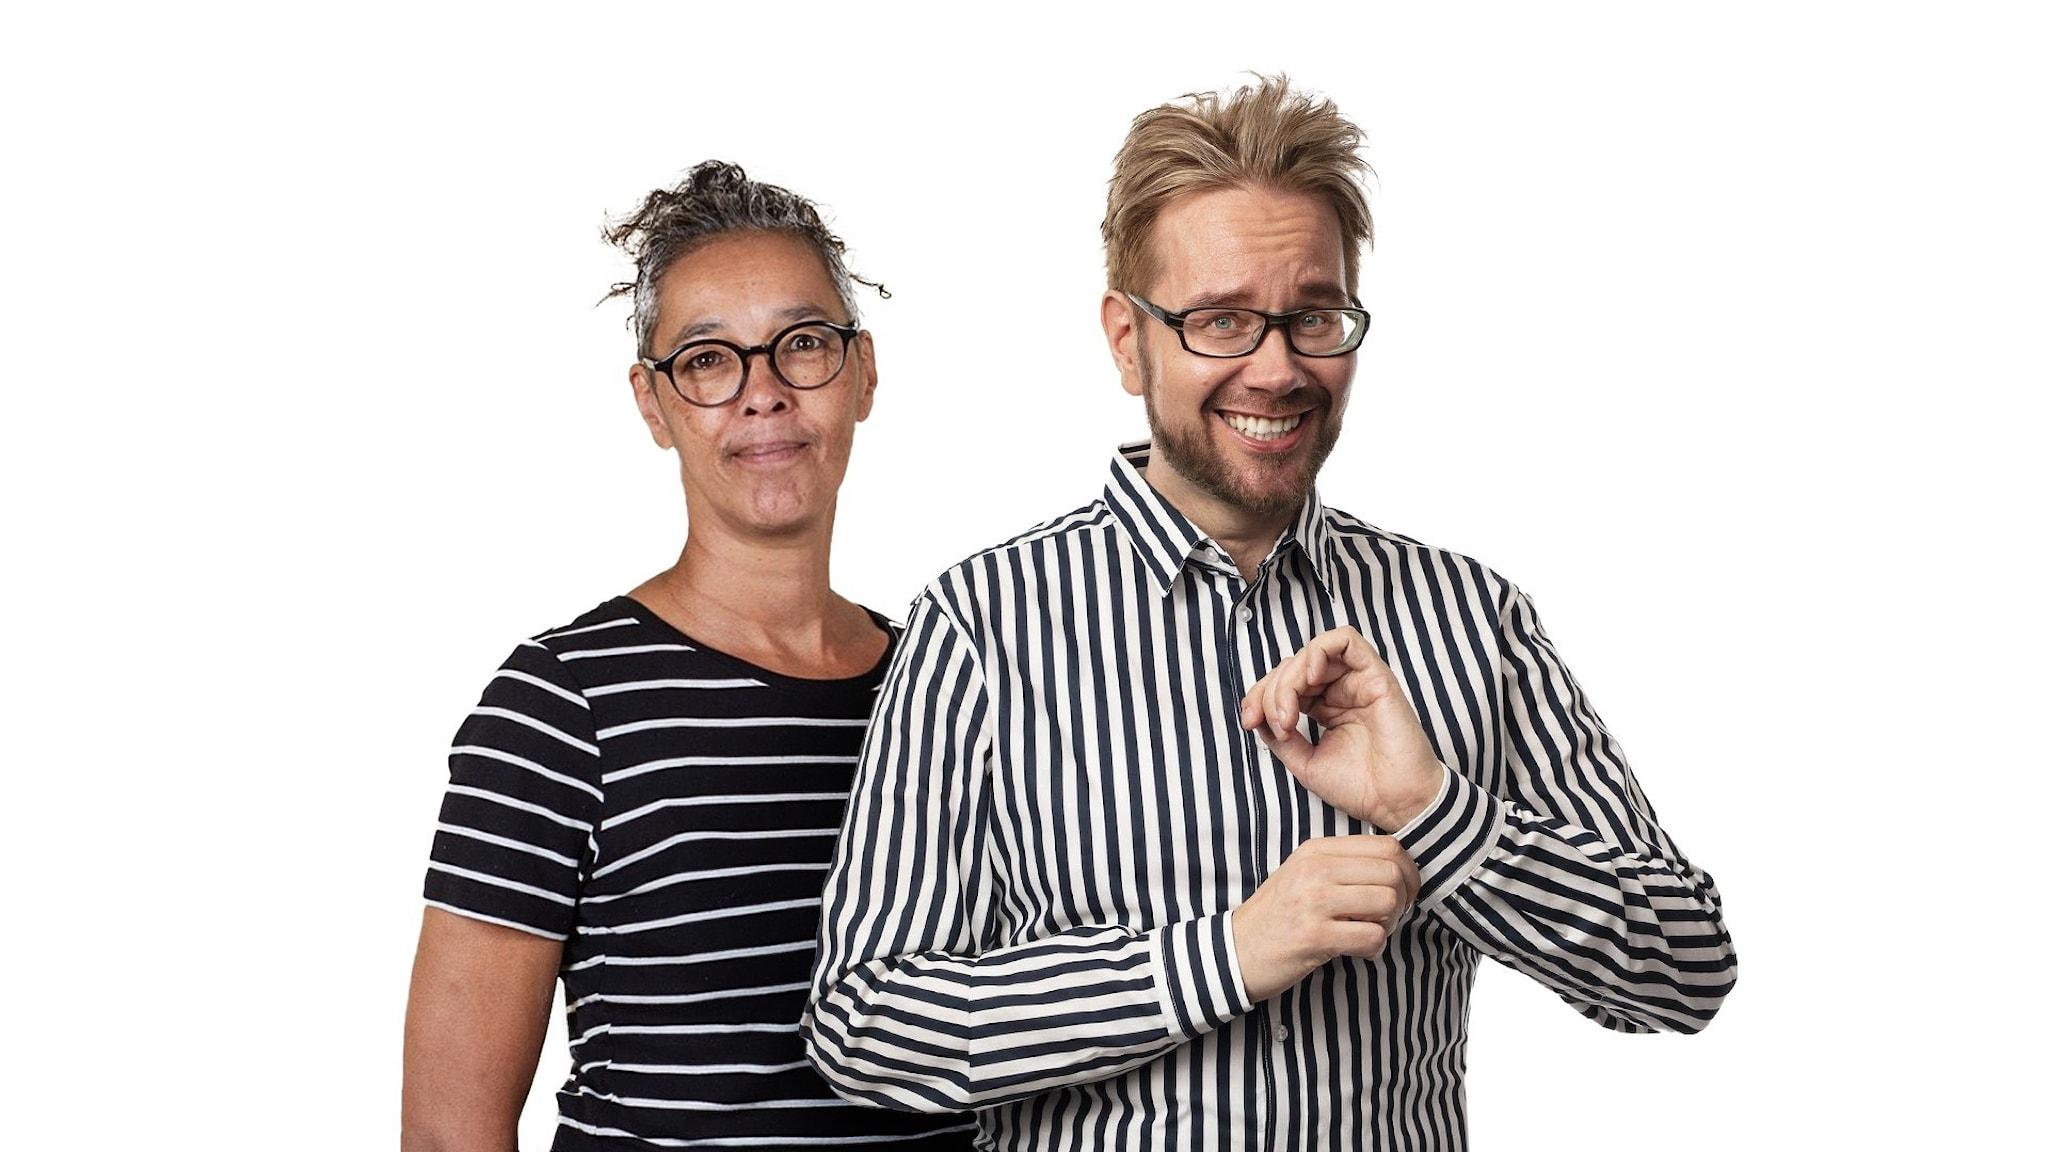 Liisa Tolonen och Erkki Kuronen